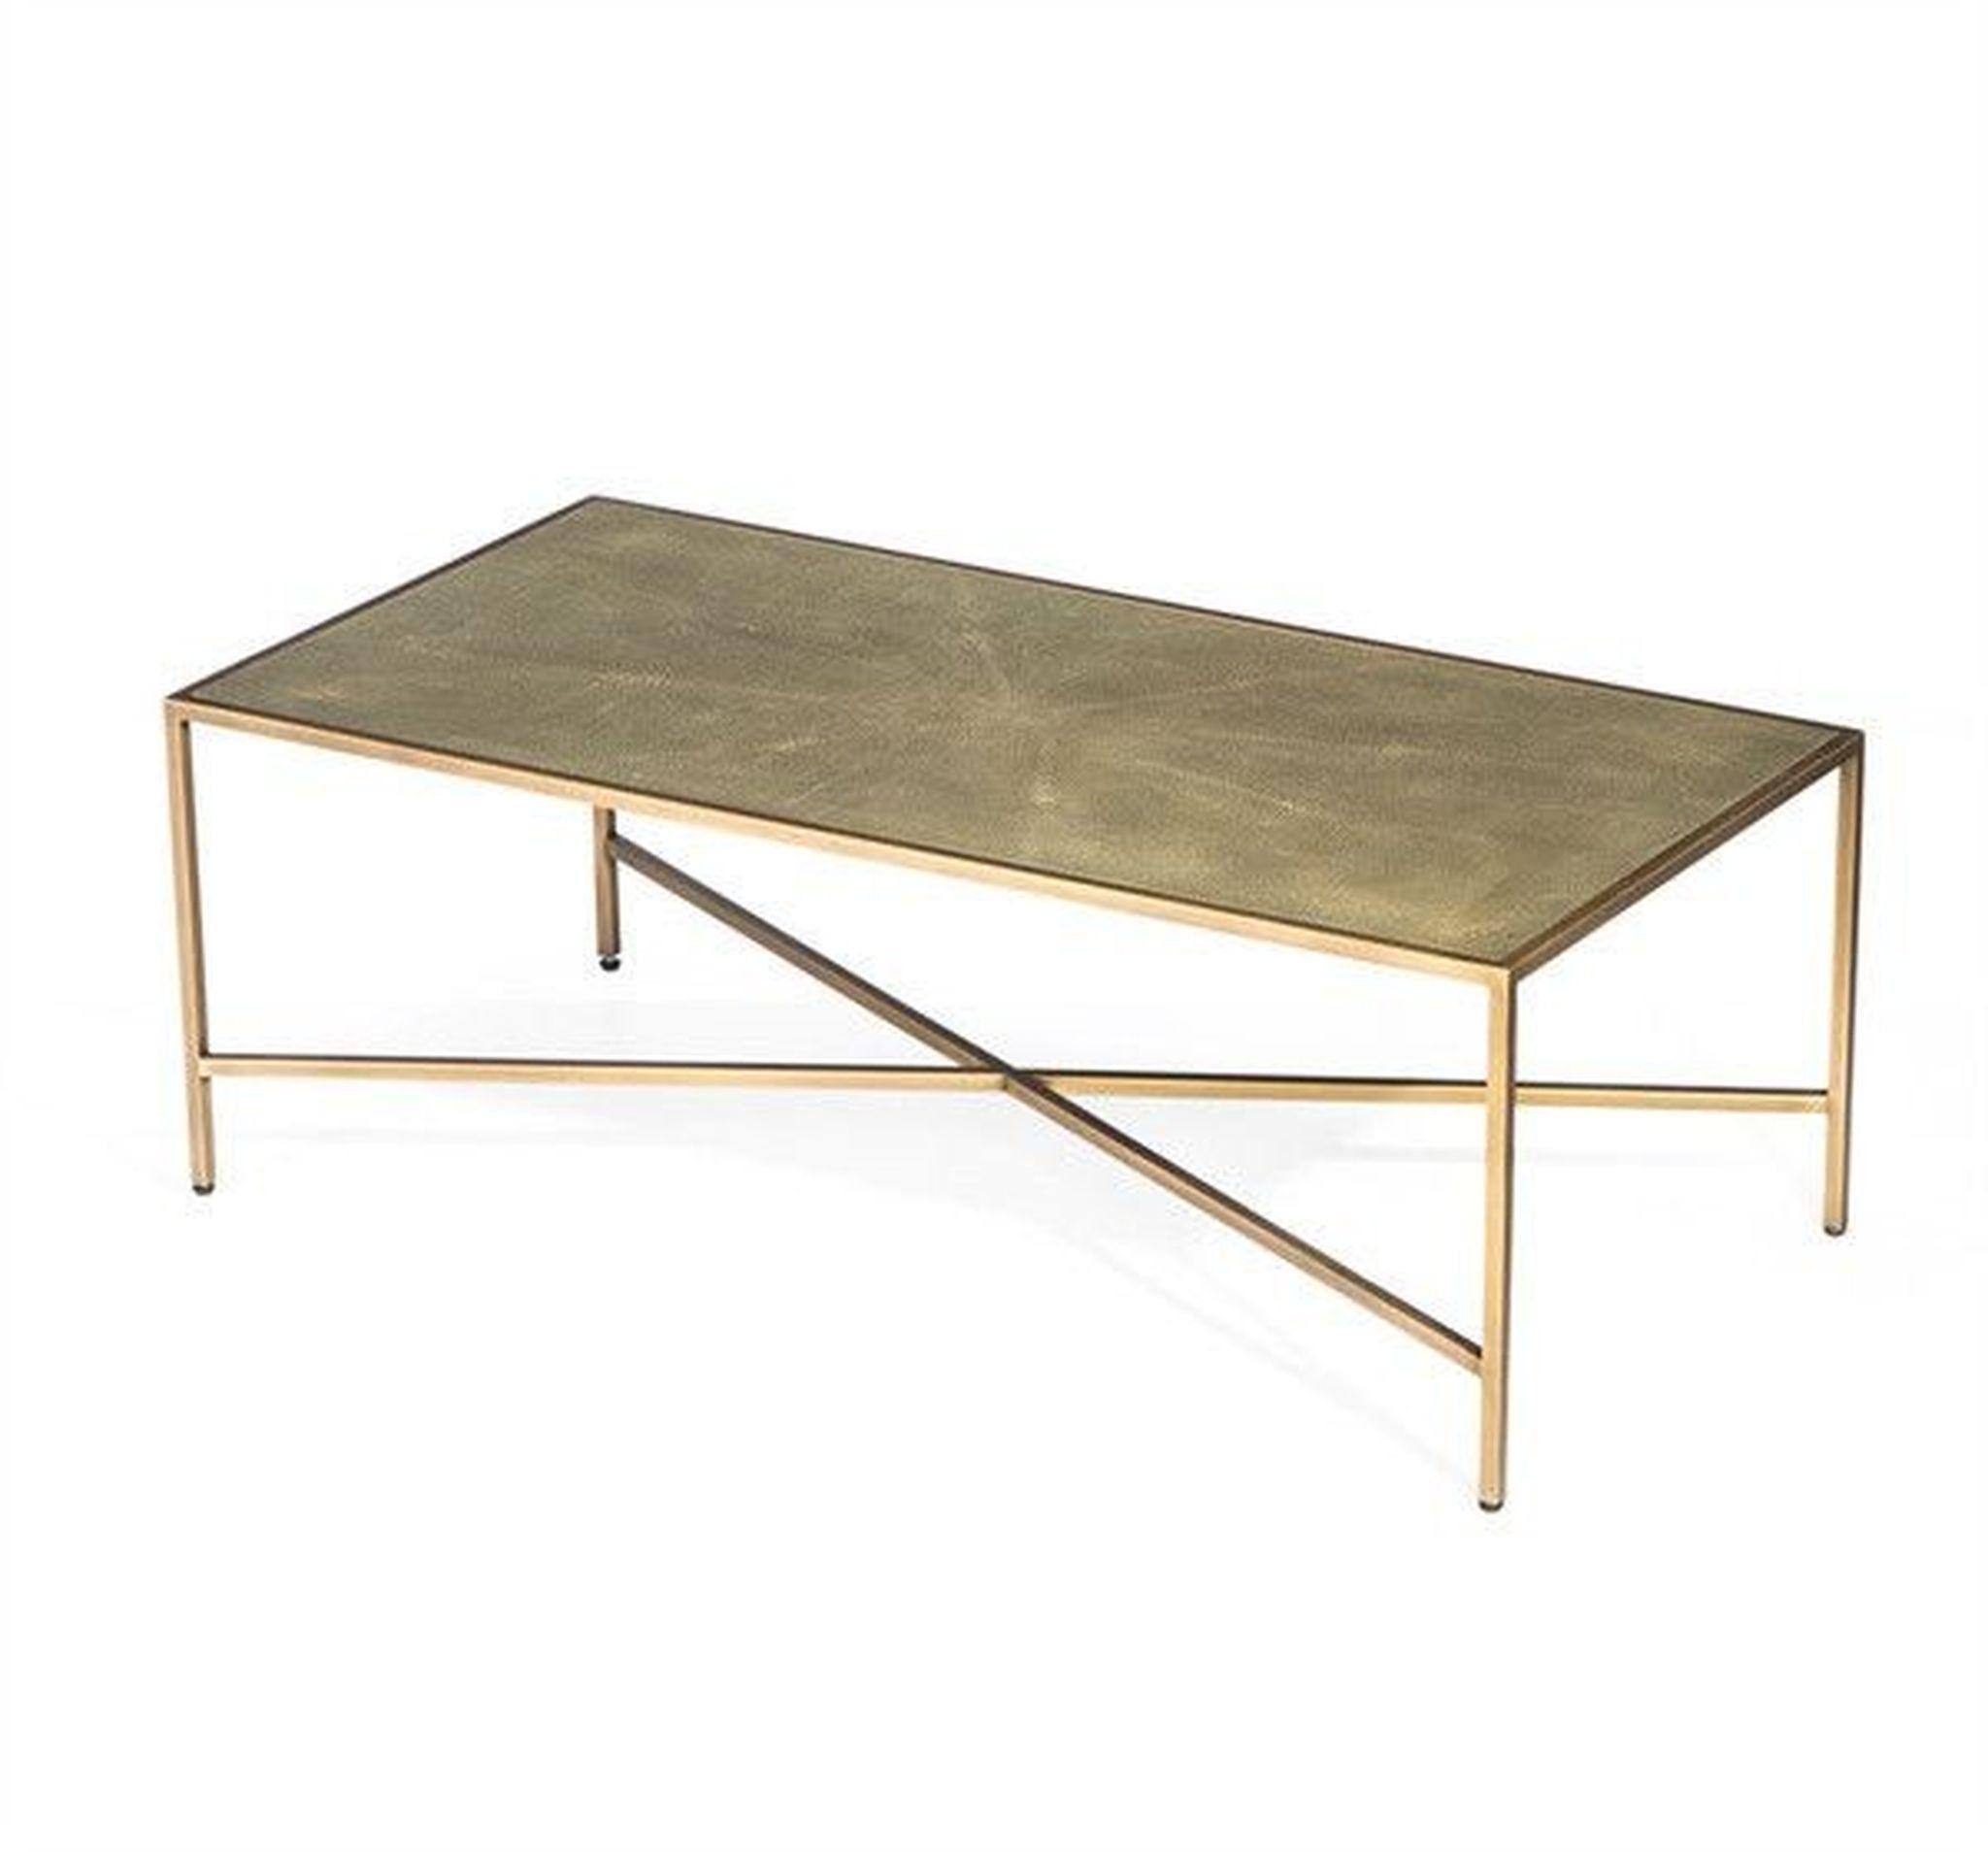 $1350 00 Dorian Shagreen Cocktail Table